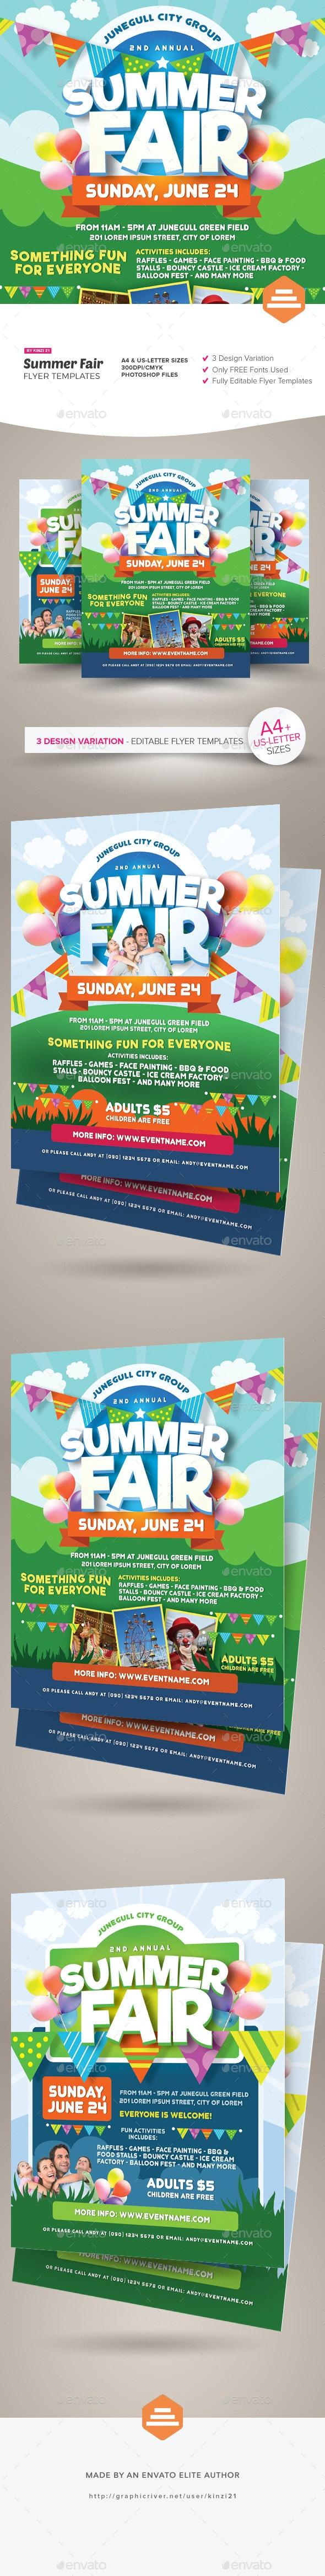 Summer Fair Flyer Templates - Miscellaneous Events